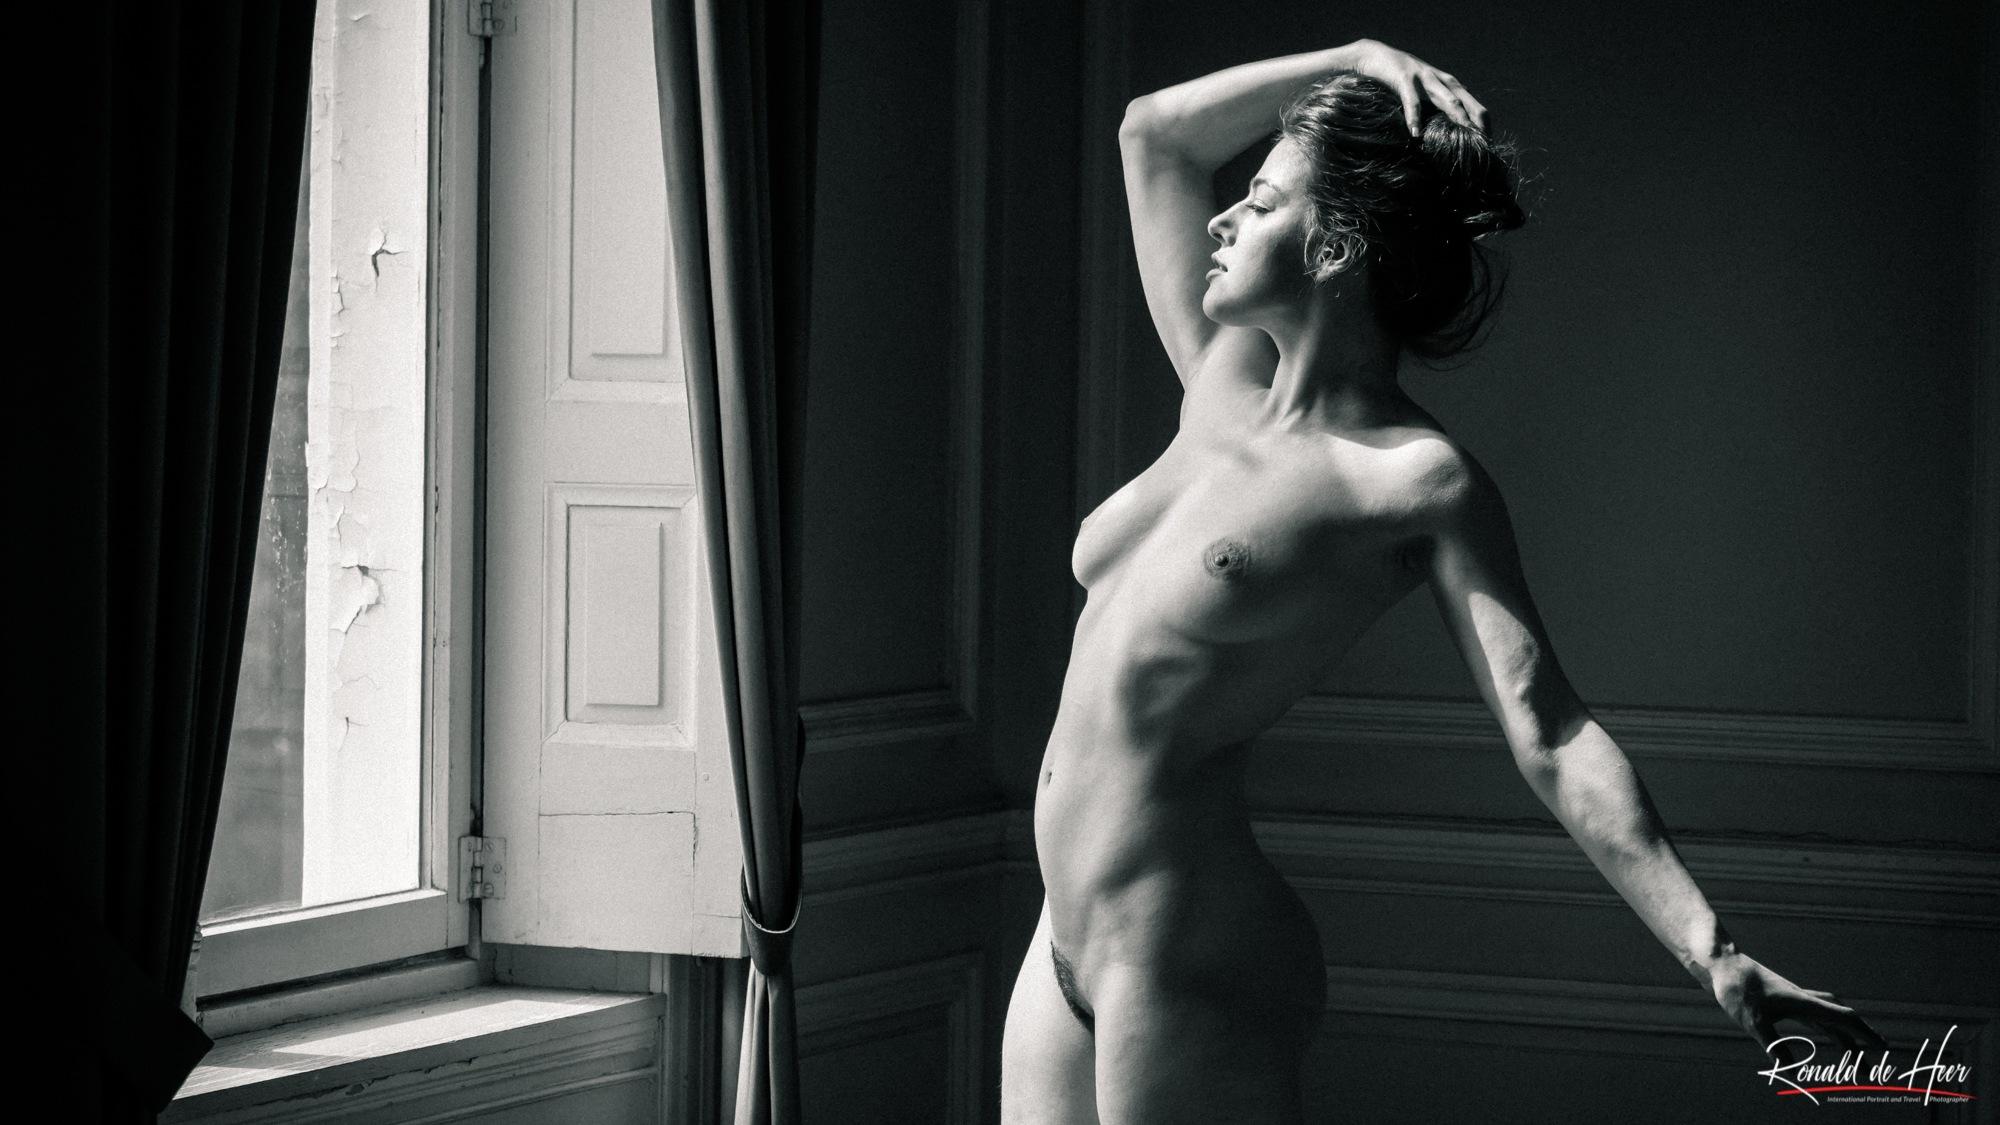 Art of Posing by DEHEER PHOTOGRAPHY